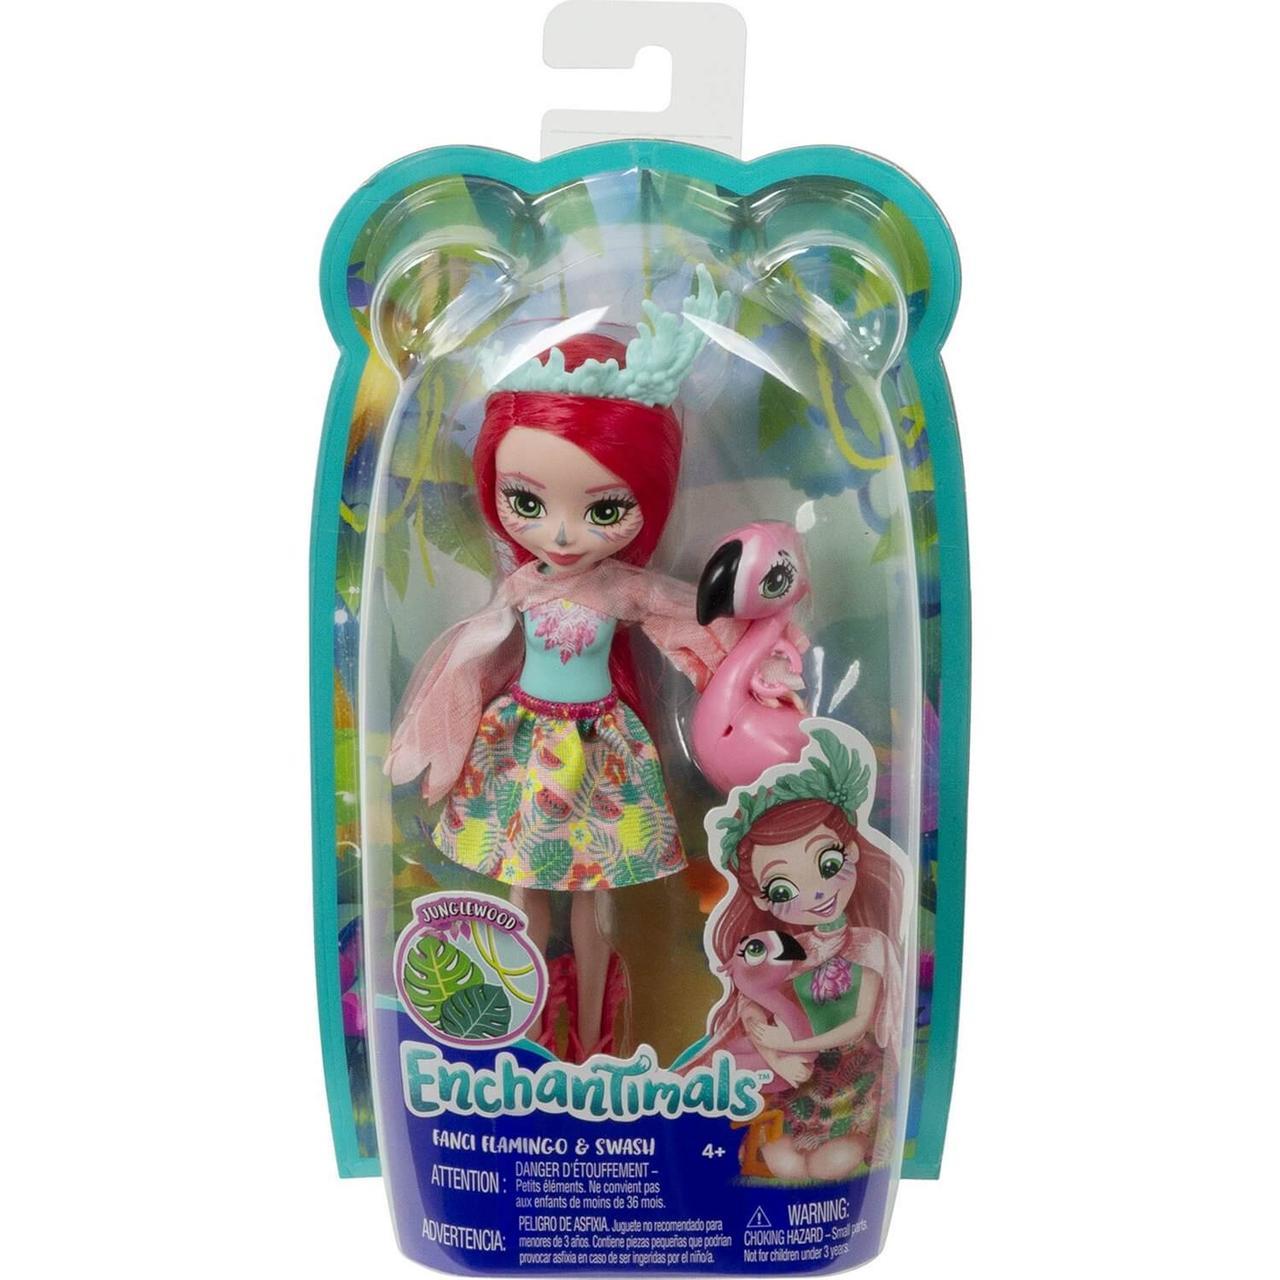 Энчантималс Enchantimals кукла с питомцем Фэнси Флэминг и Свош GFN42